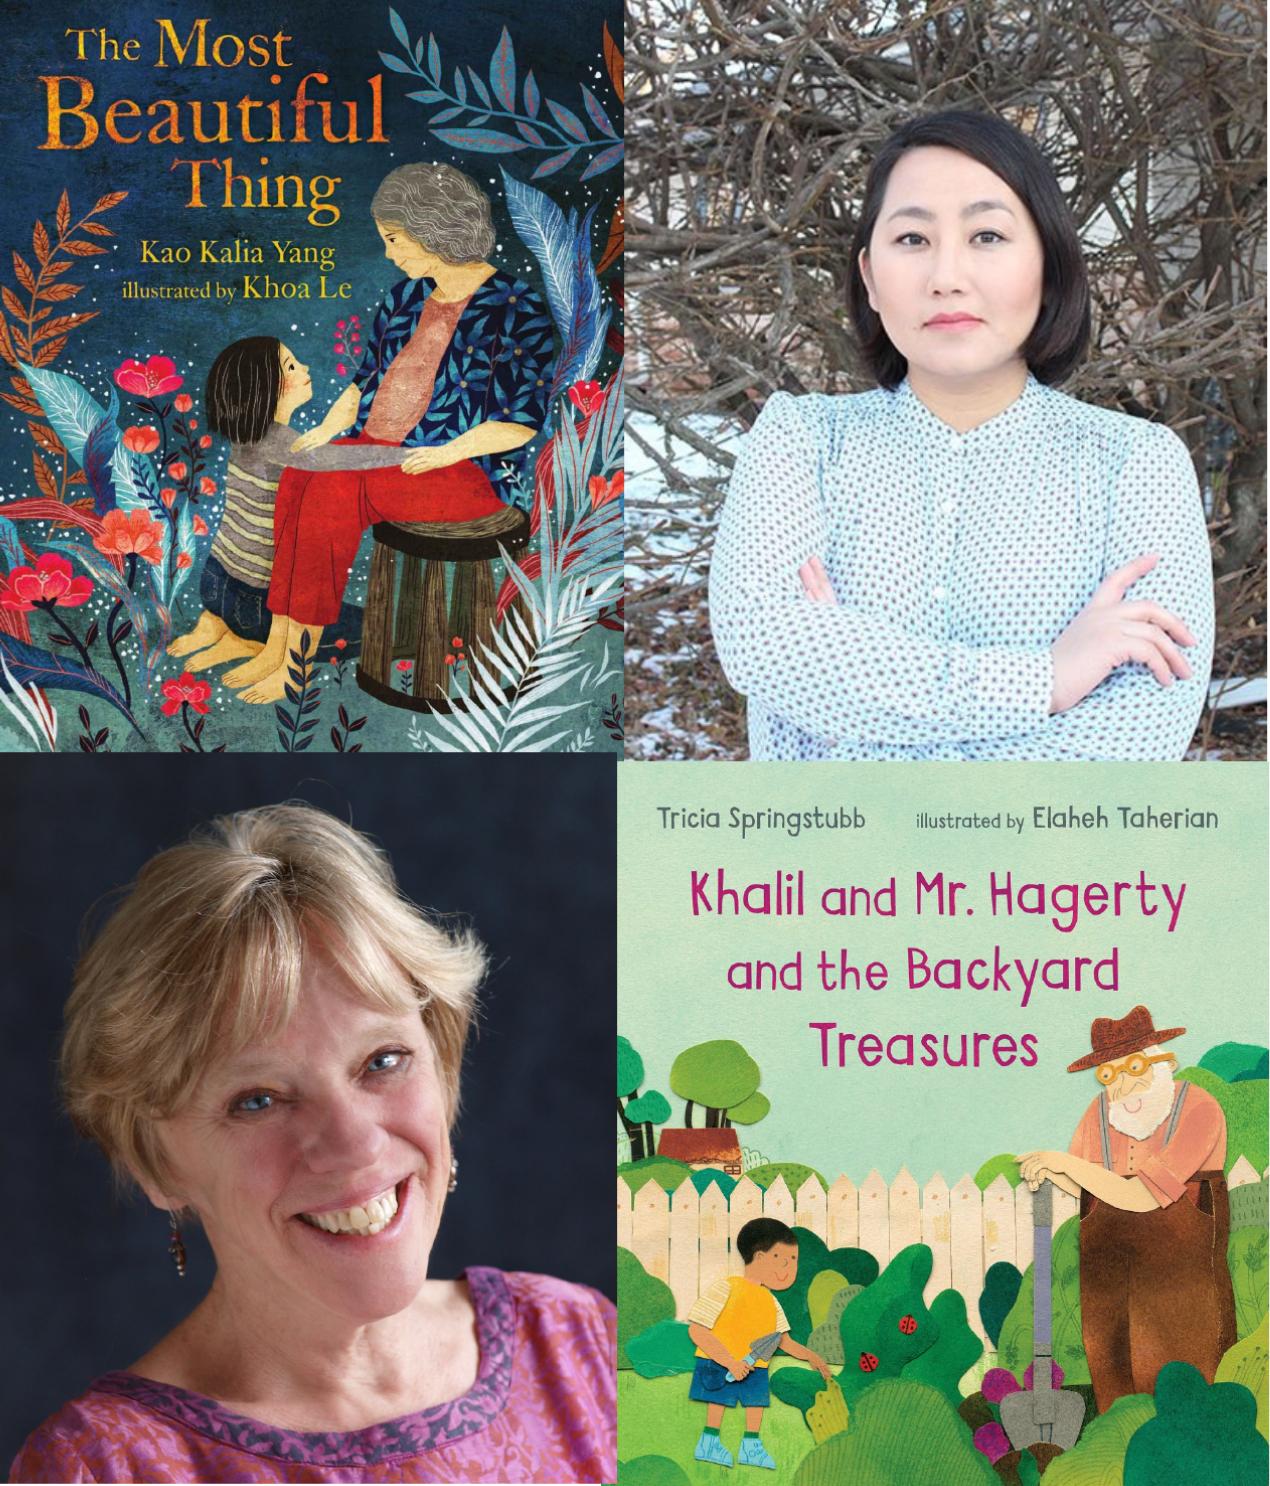 Saratoga Book Festival Online: Kao Kalia Yang and Tricia Springstubb in Conversation